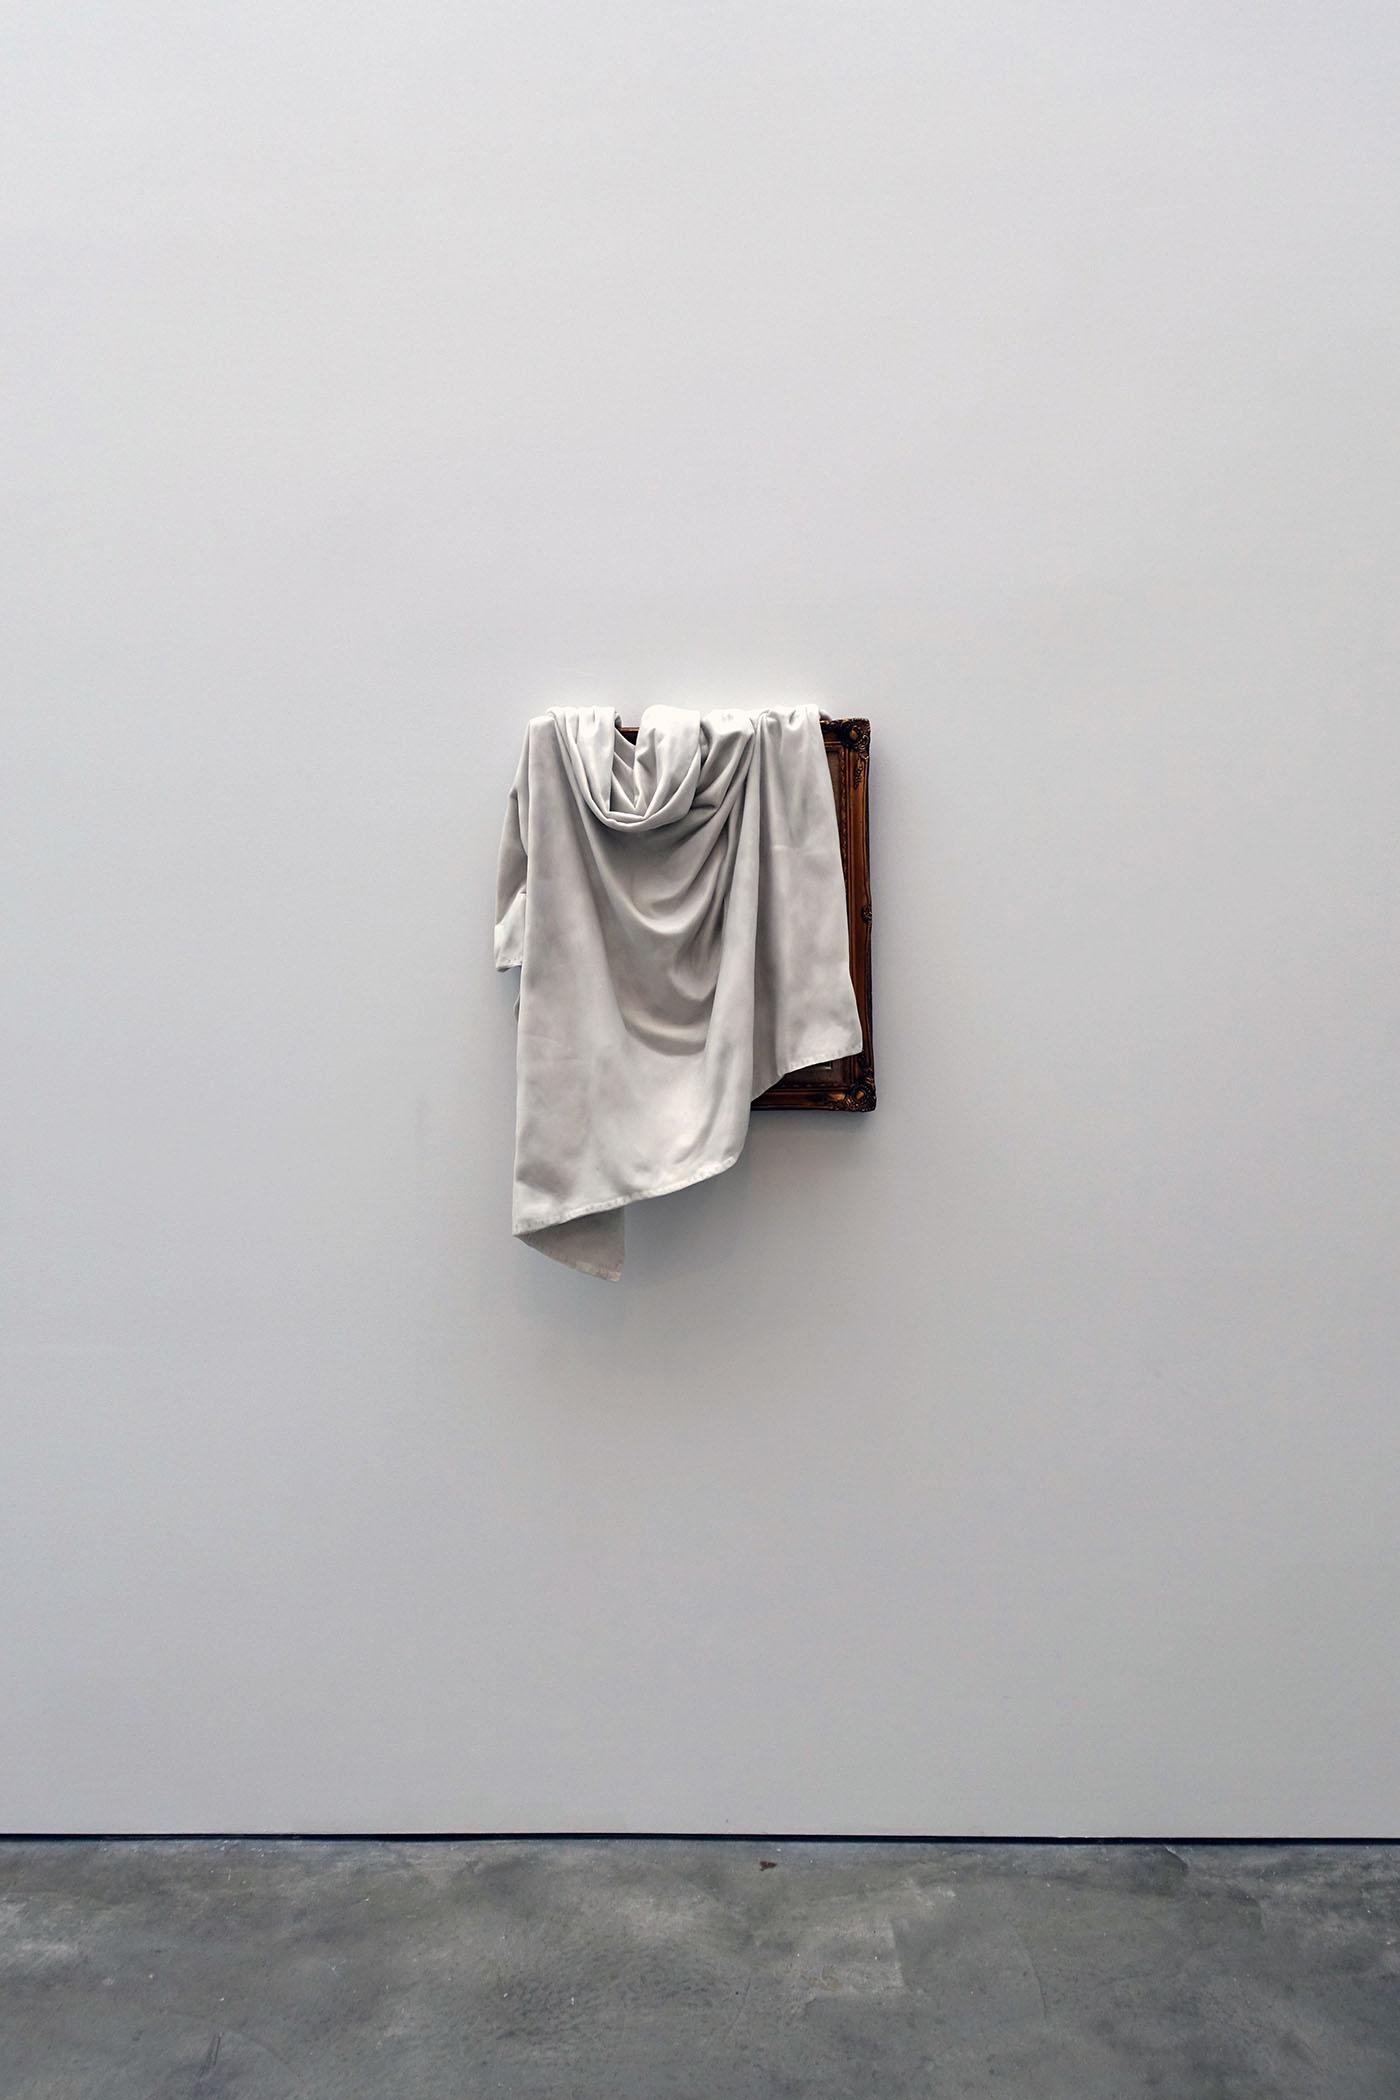 Ryan Gander  @ Lisson Gallery, 504 West 24th Street, NY, NY